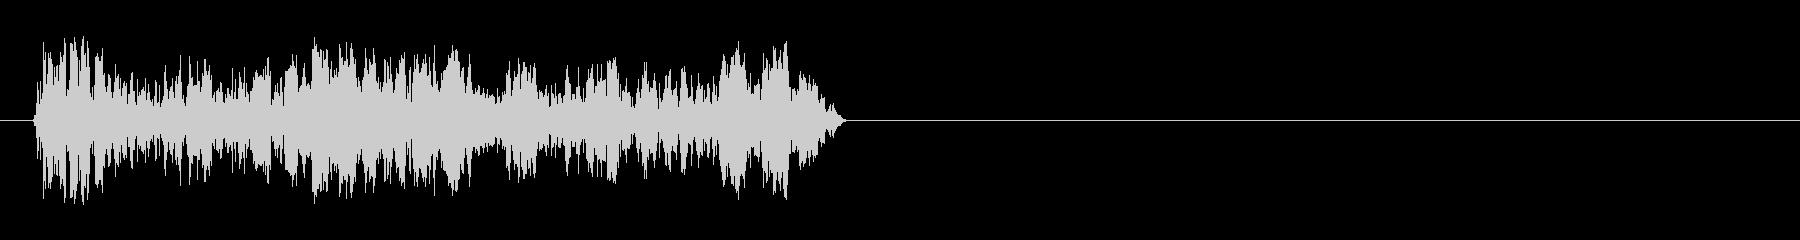 DJ スクラッチ ズクズク 場面転換の未再生の波形